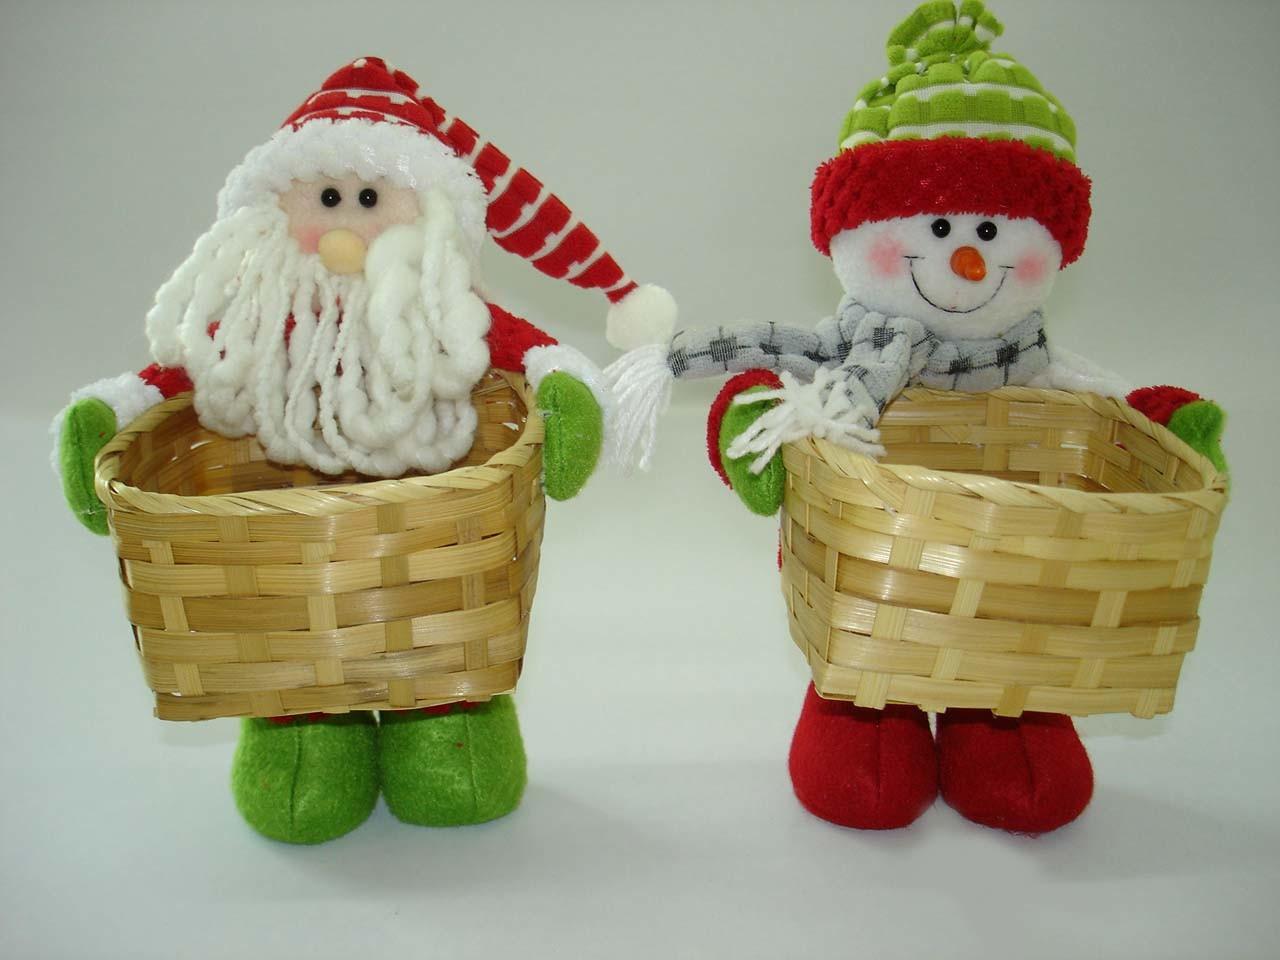 China santa claus and snowman with basket vs